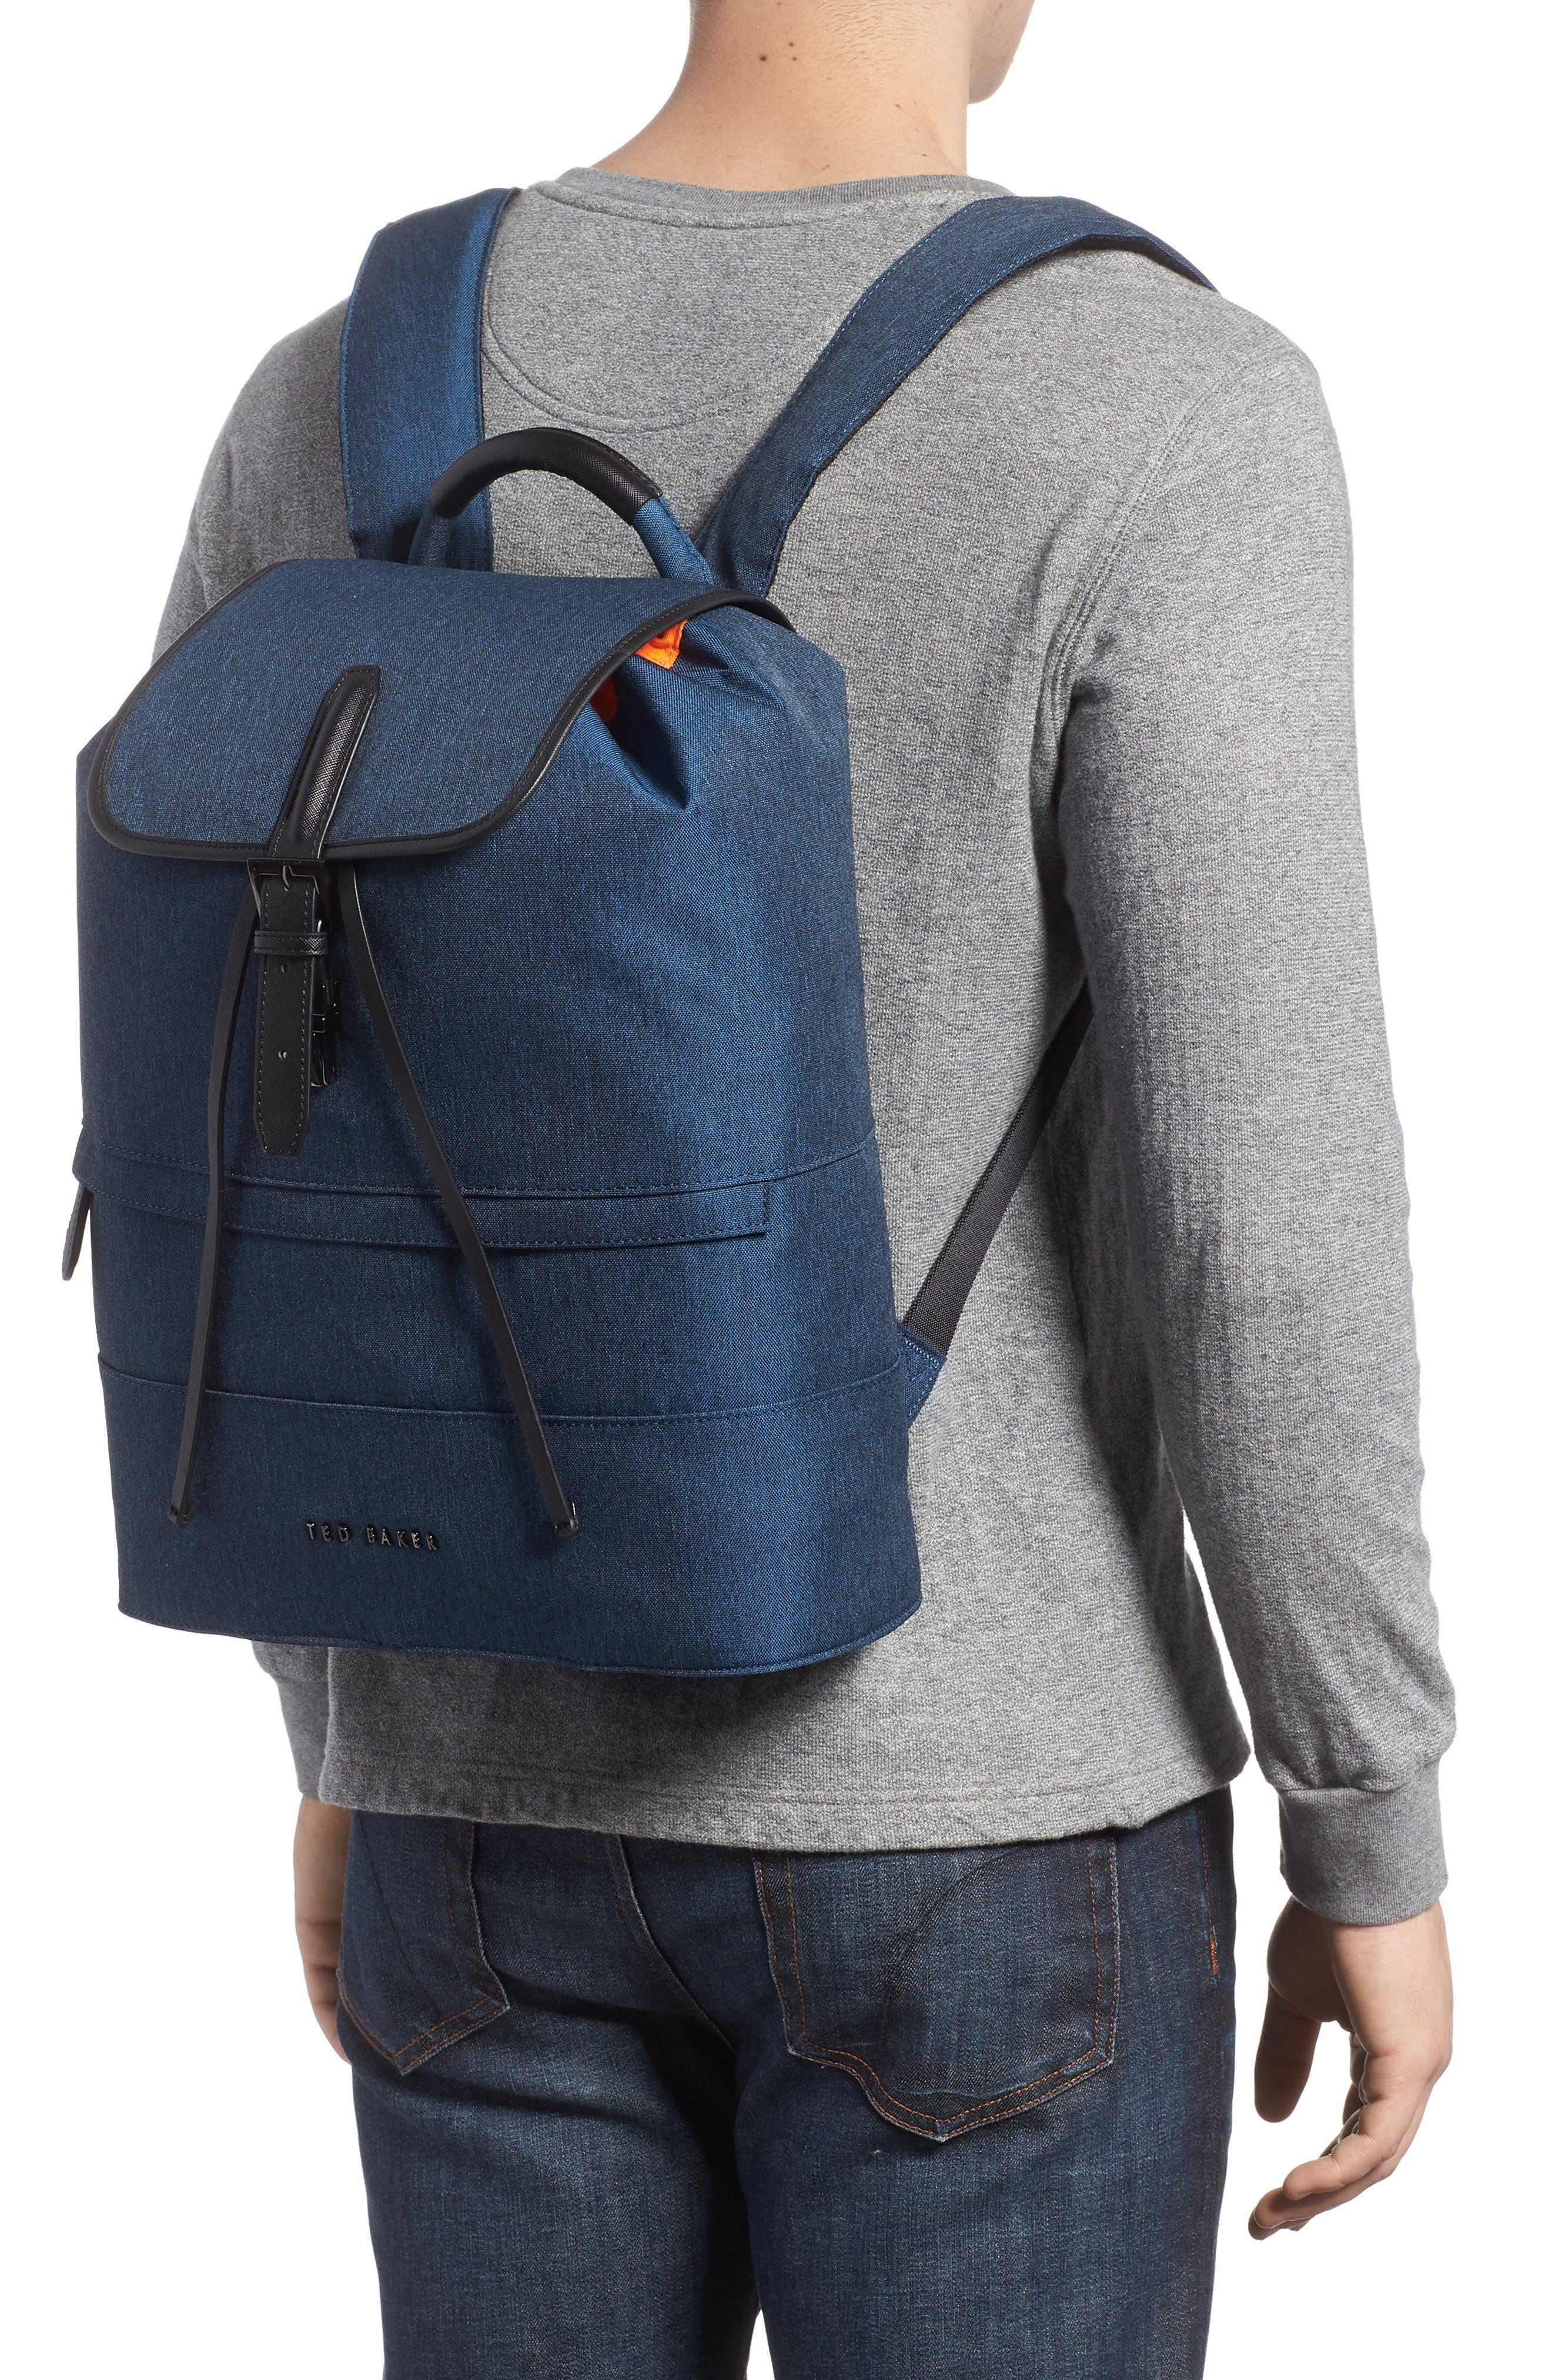 Rayman Backpack,                             Alternate thumbnail 2, color,                             Blue